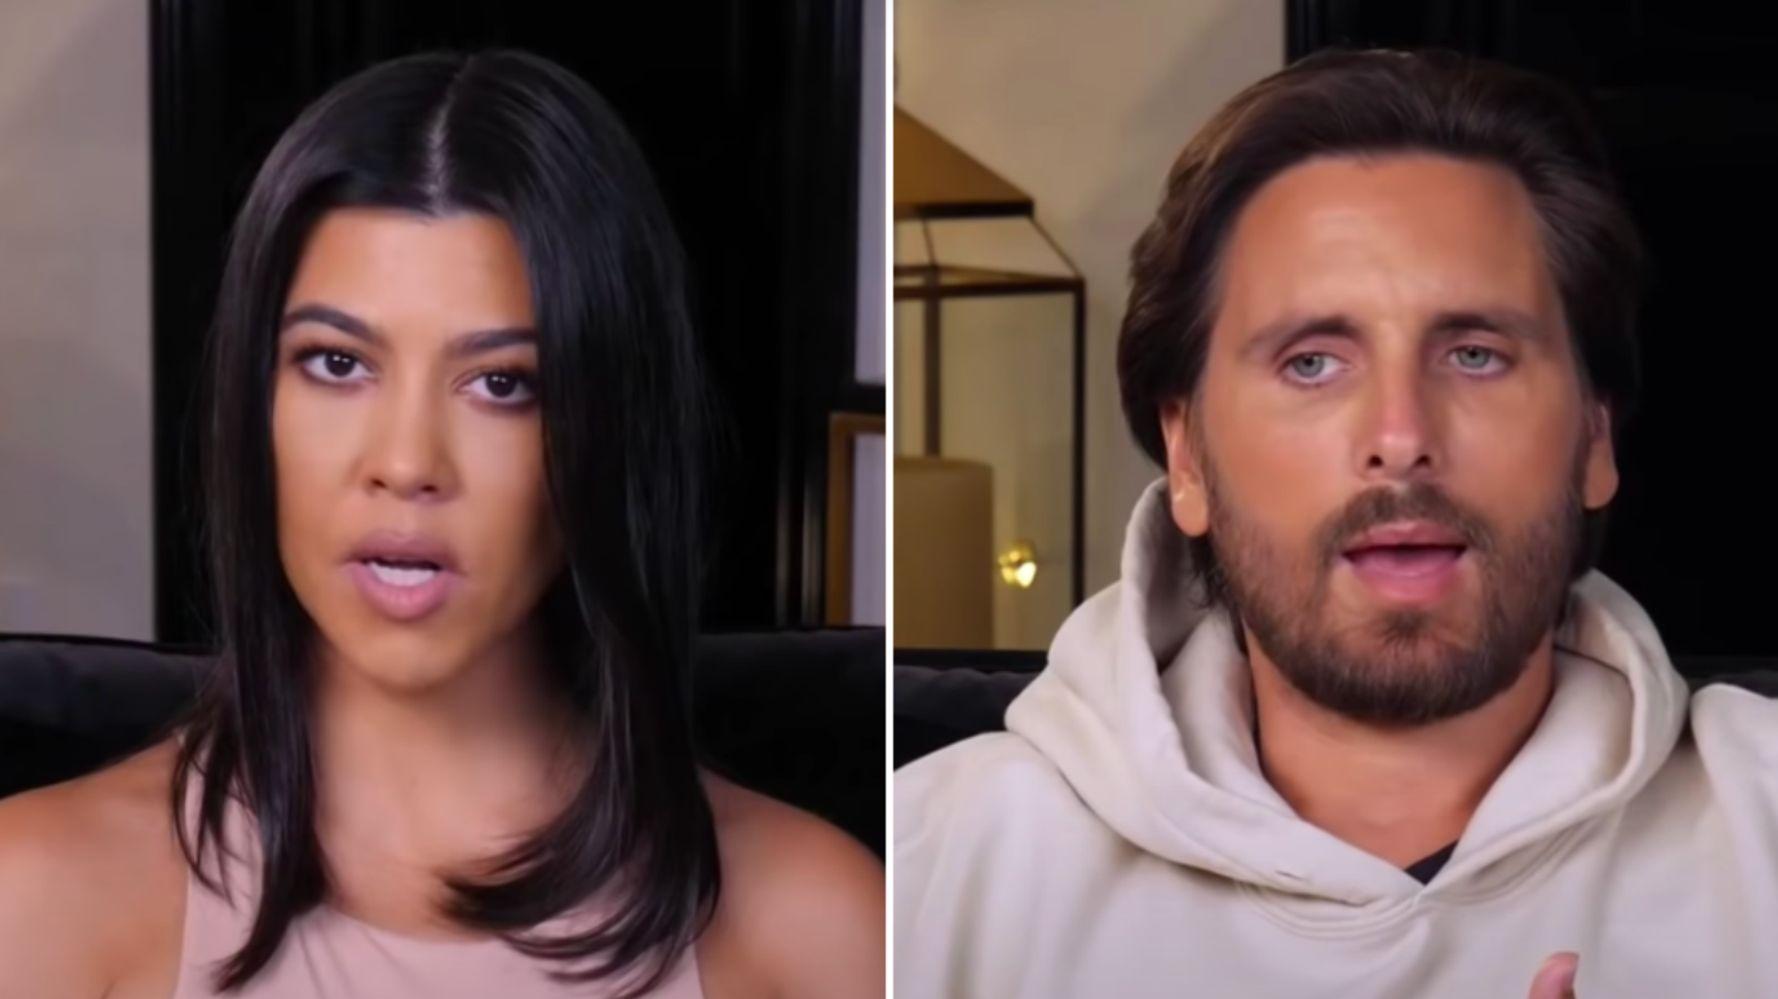 Scott Disick Opens Up To Ex Kourtney Kardashian About Returning To Rehab